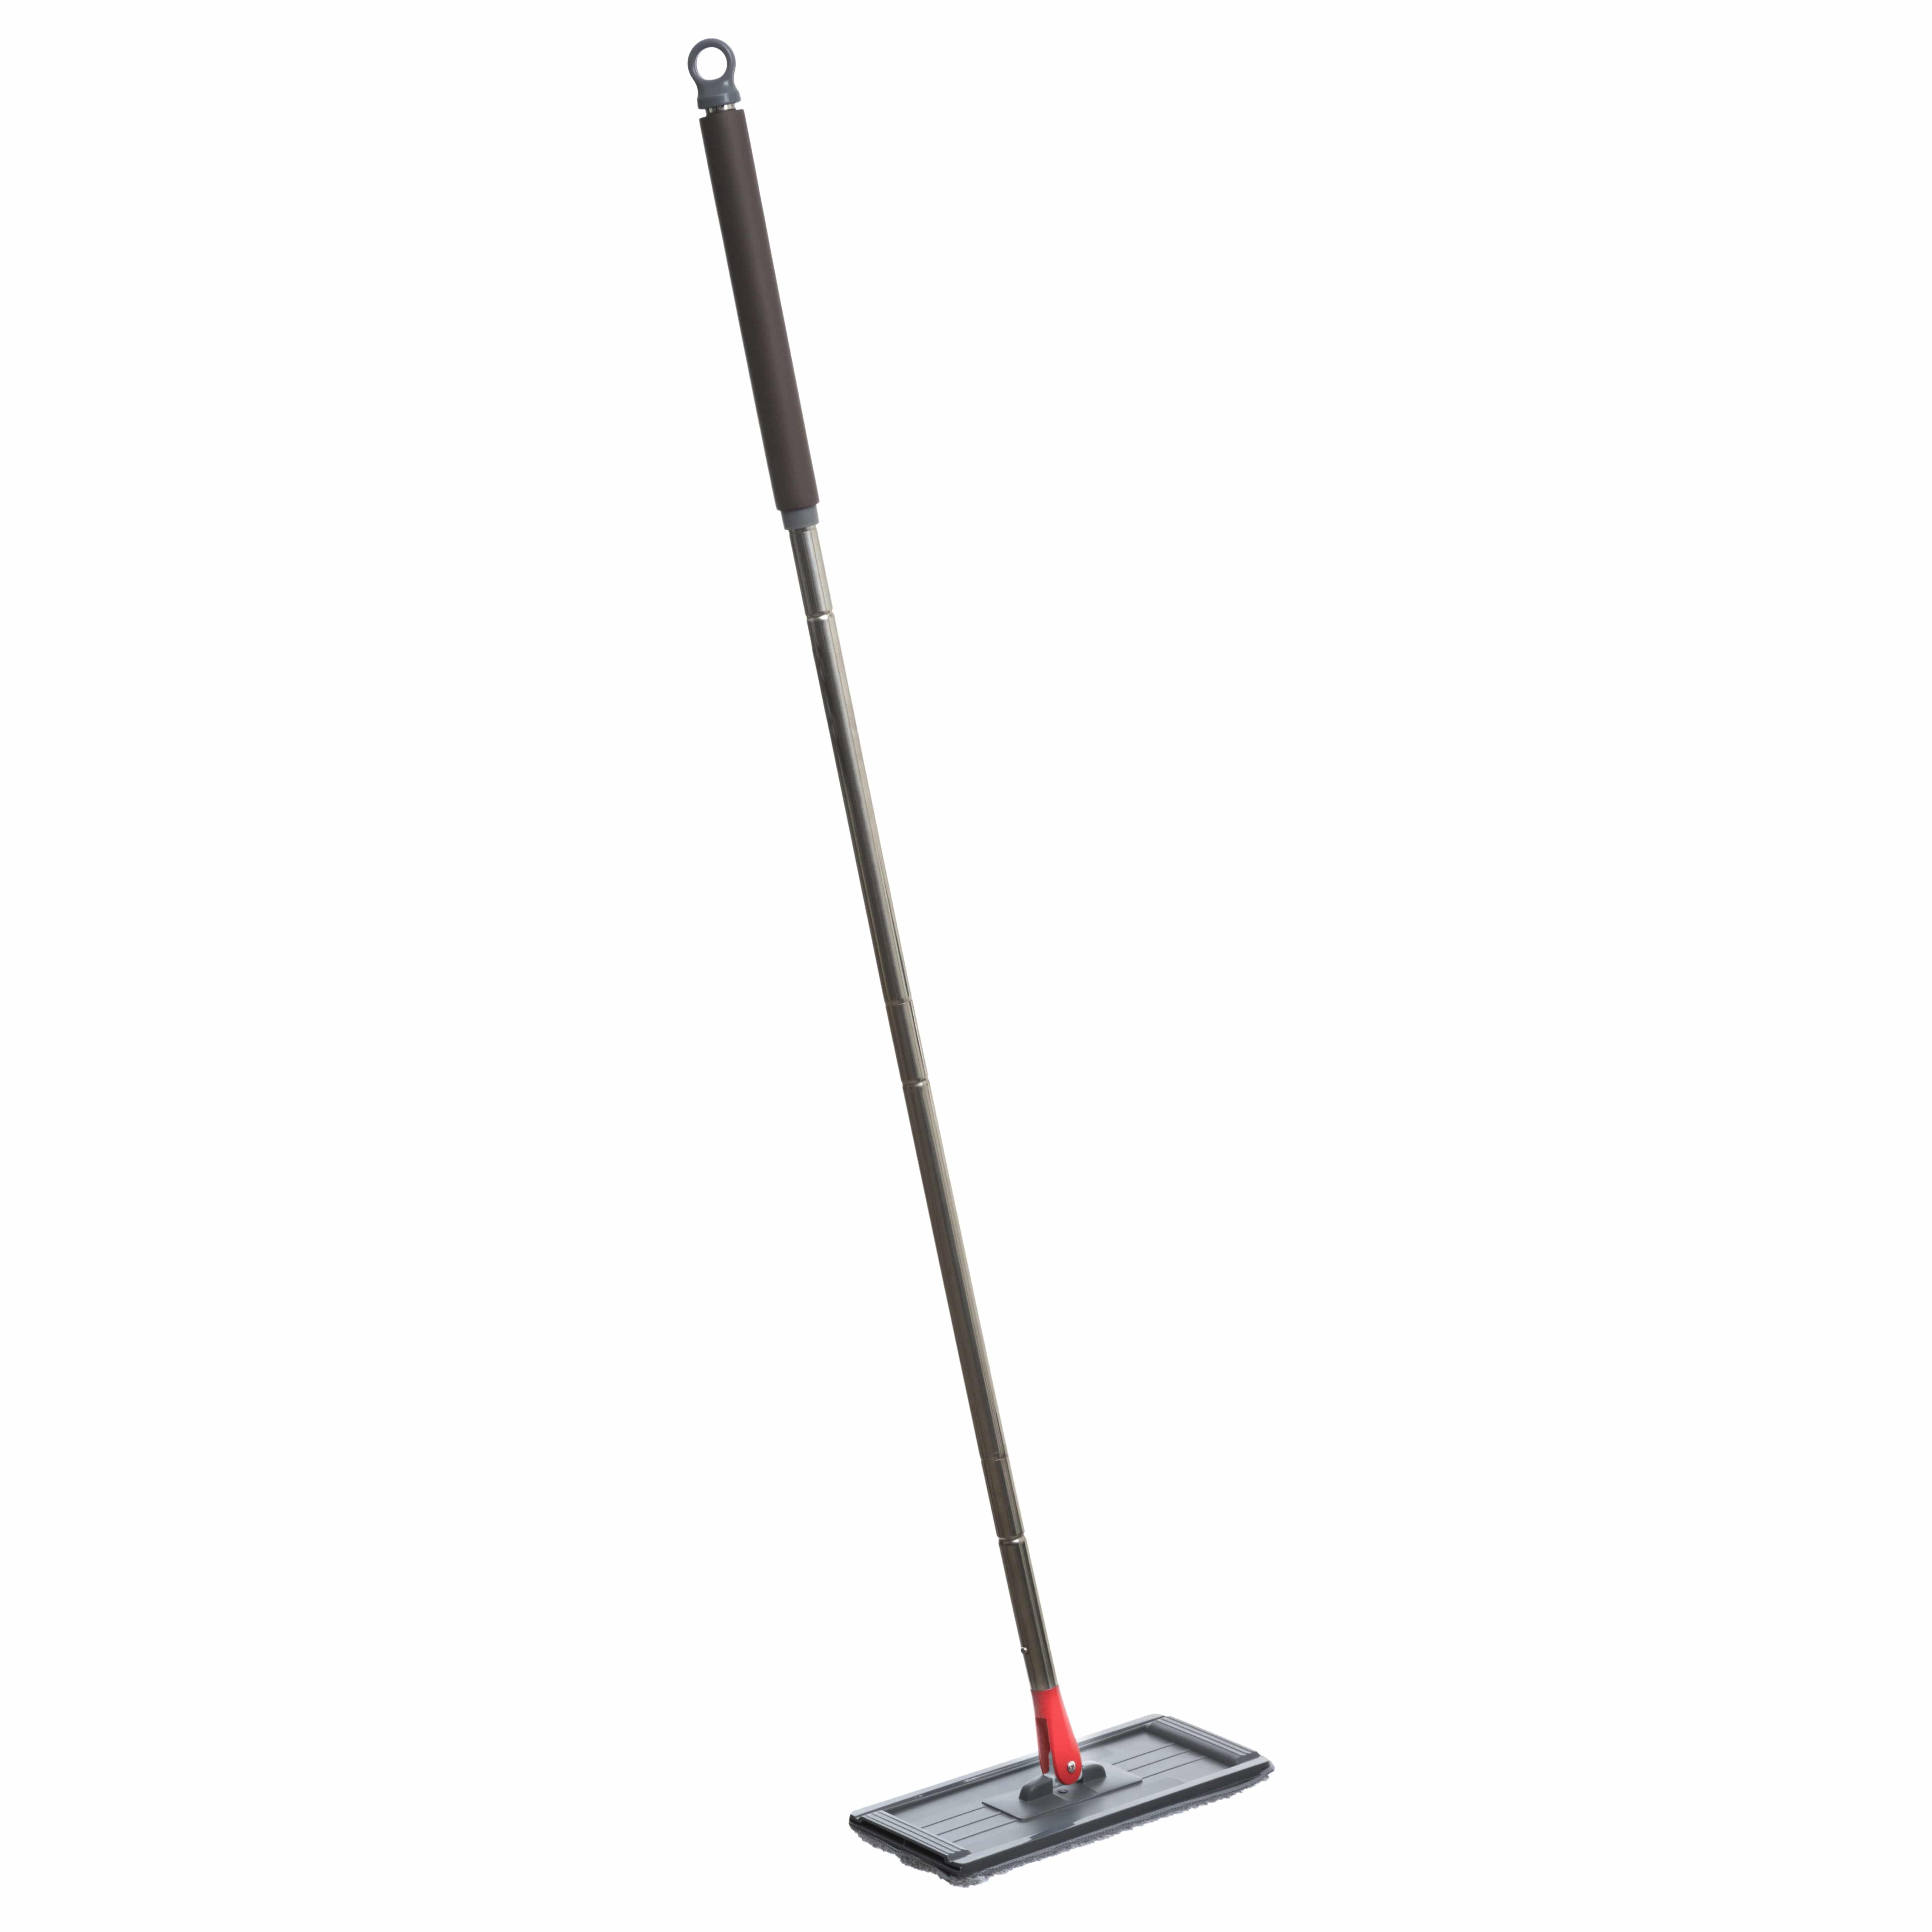 4goodz Dweilsysteem Flat Mop 2.0 Lena 130cm lange steel emmer 7 ltr